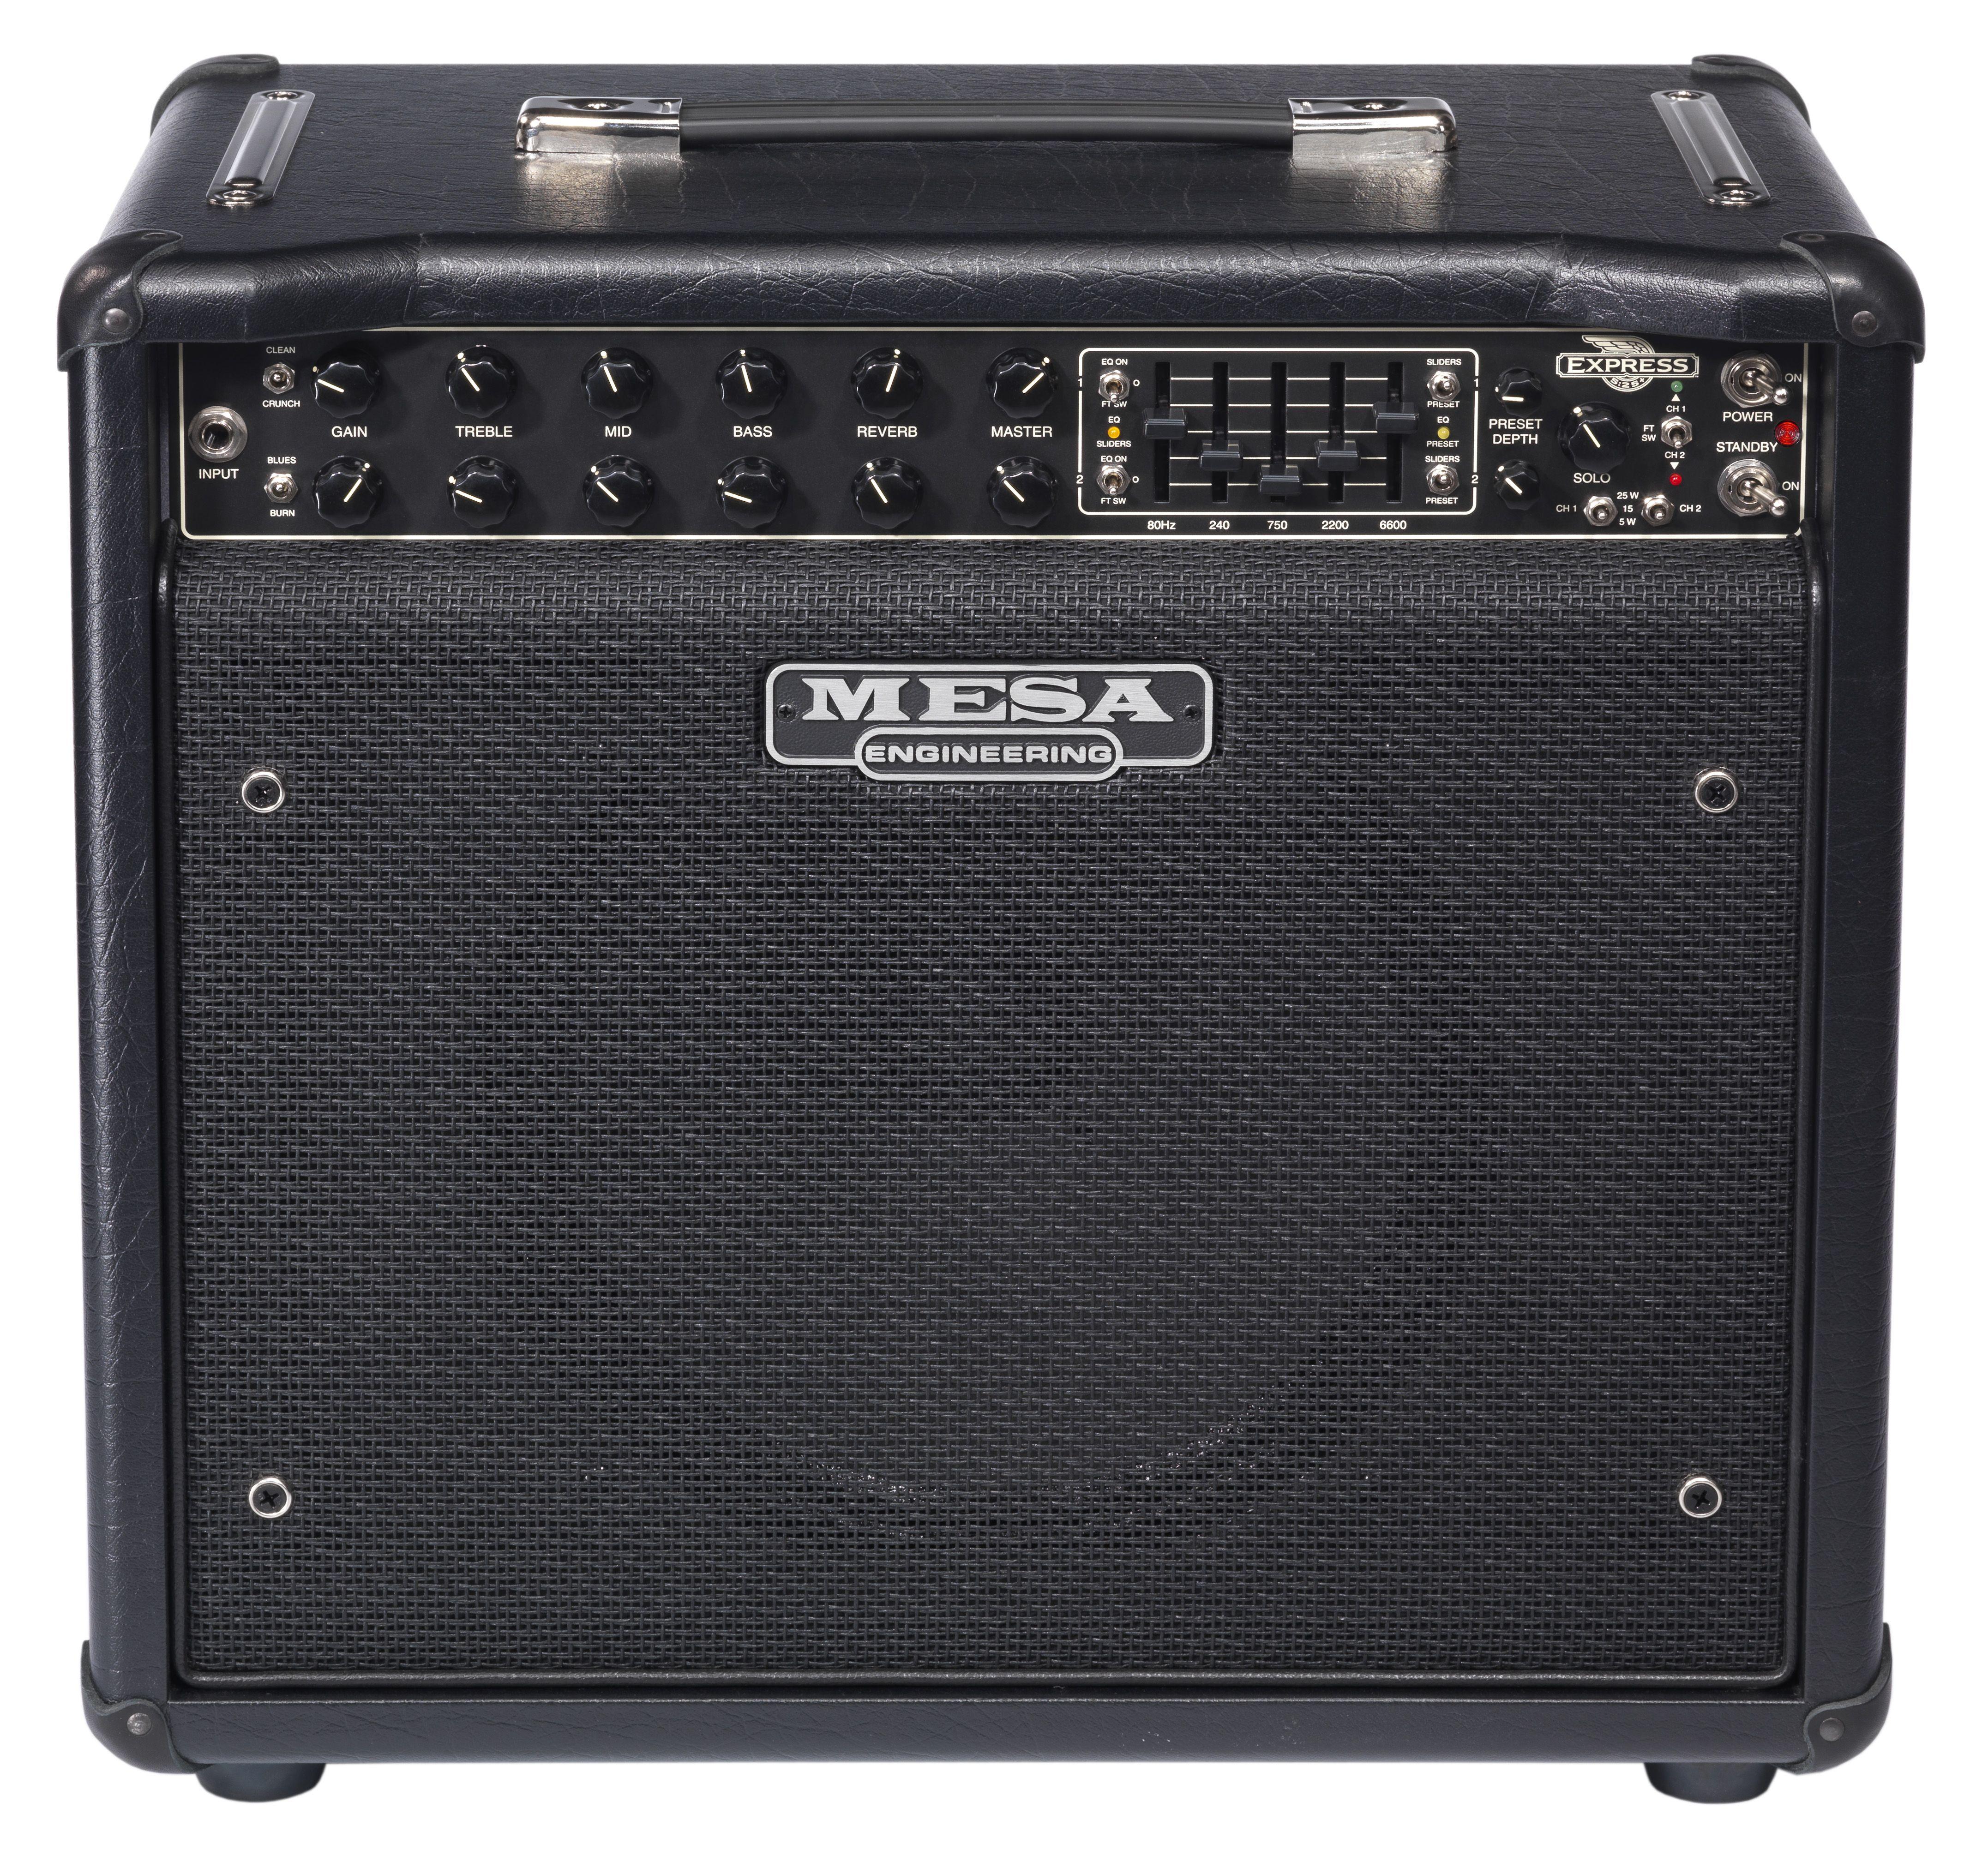 Mesa Boogie Express 5 25 1x12 Plus 25 Watt Music Mart Guitar Amp Acoustic Guitar Amp Amplifier